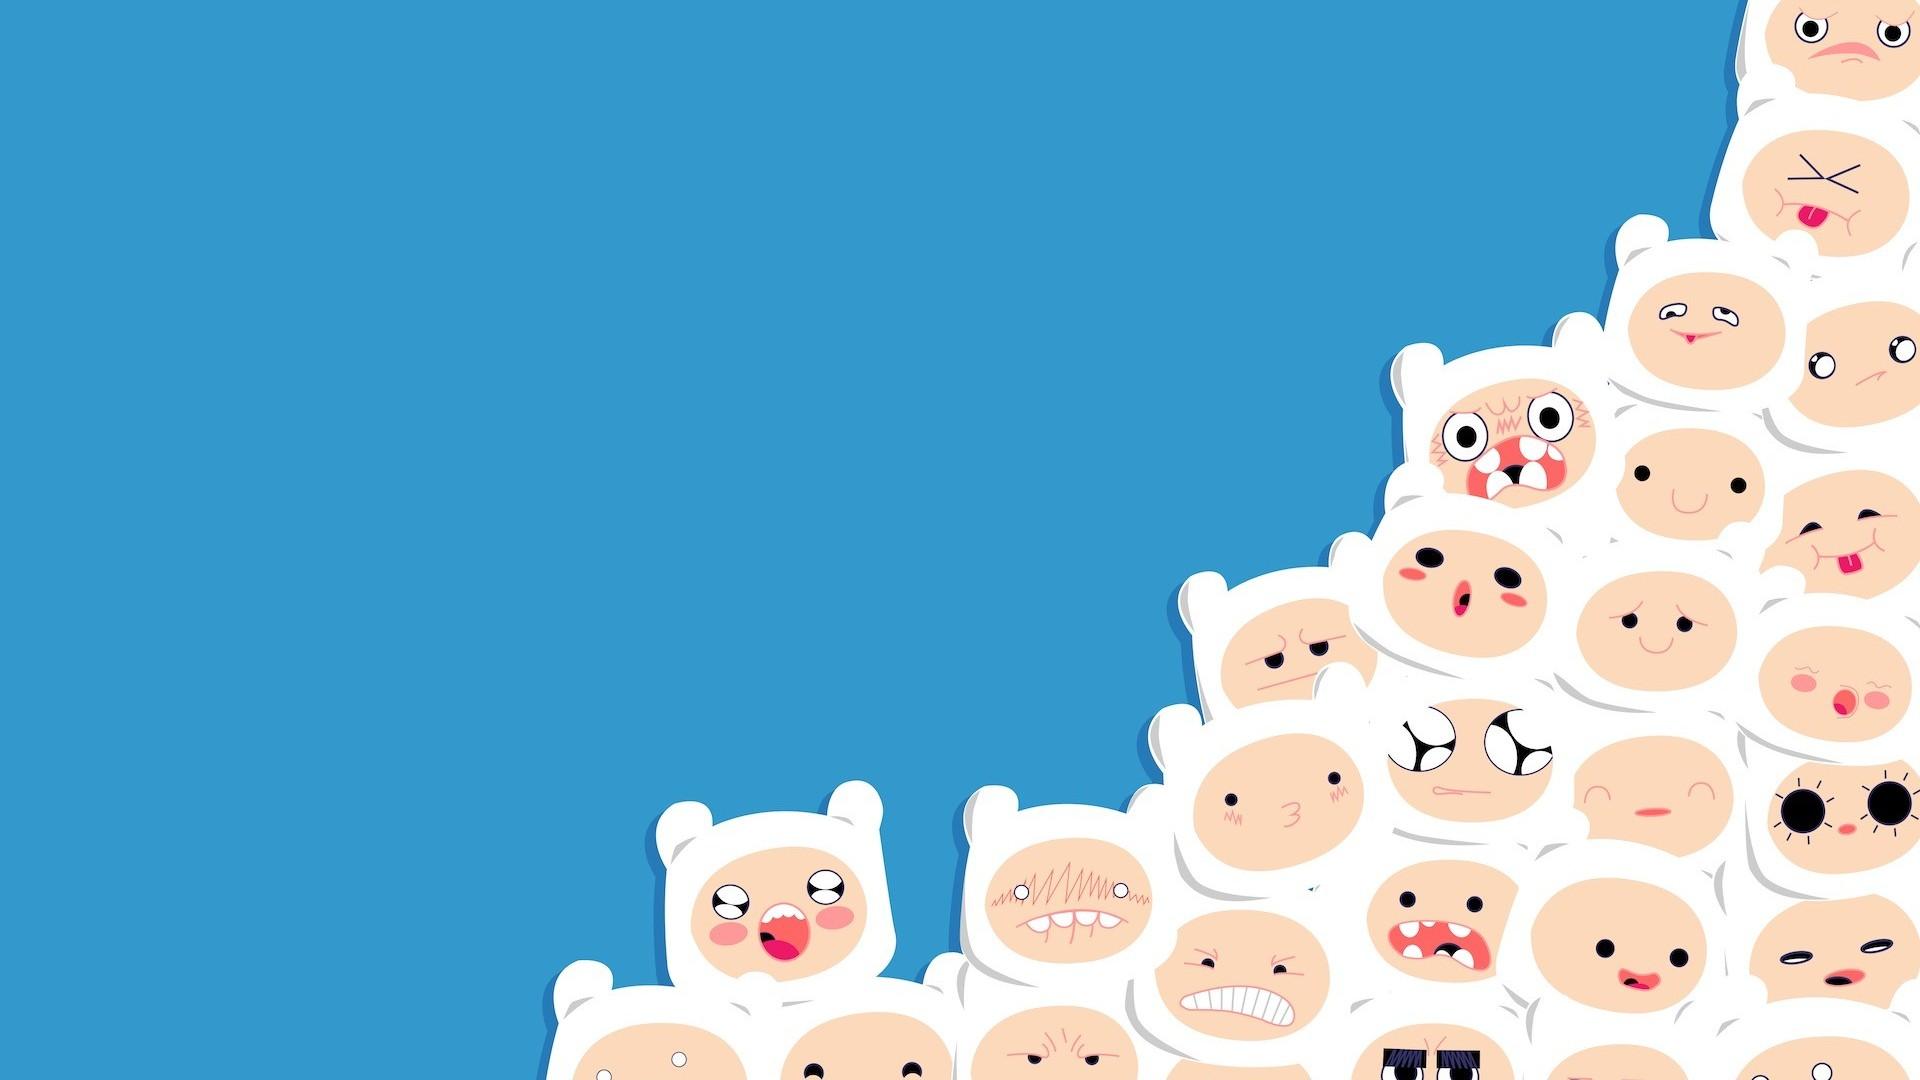 Best Adventure Time Backgrounds   Wallpaper High Definition High 1920x1080